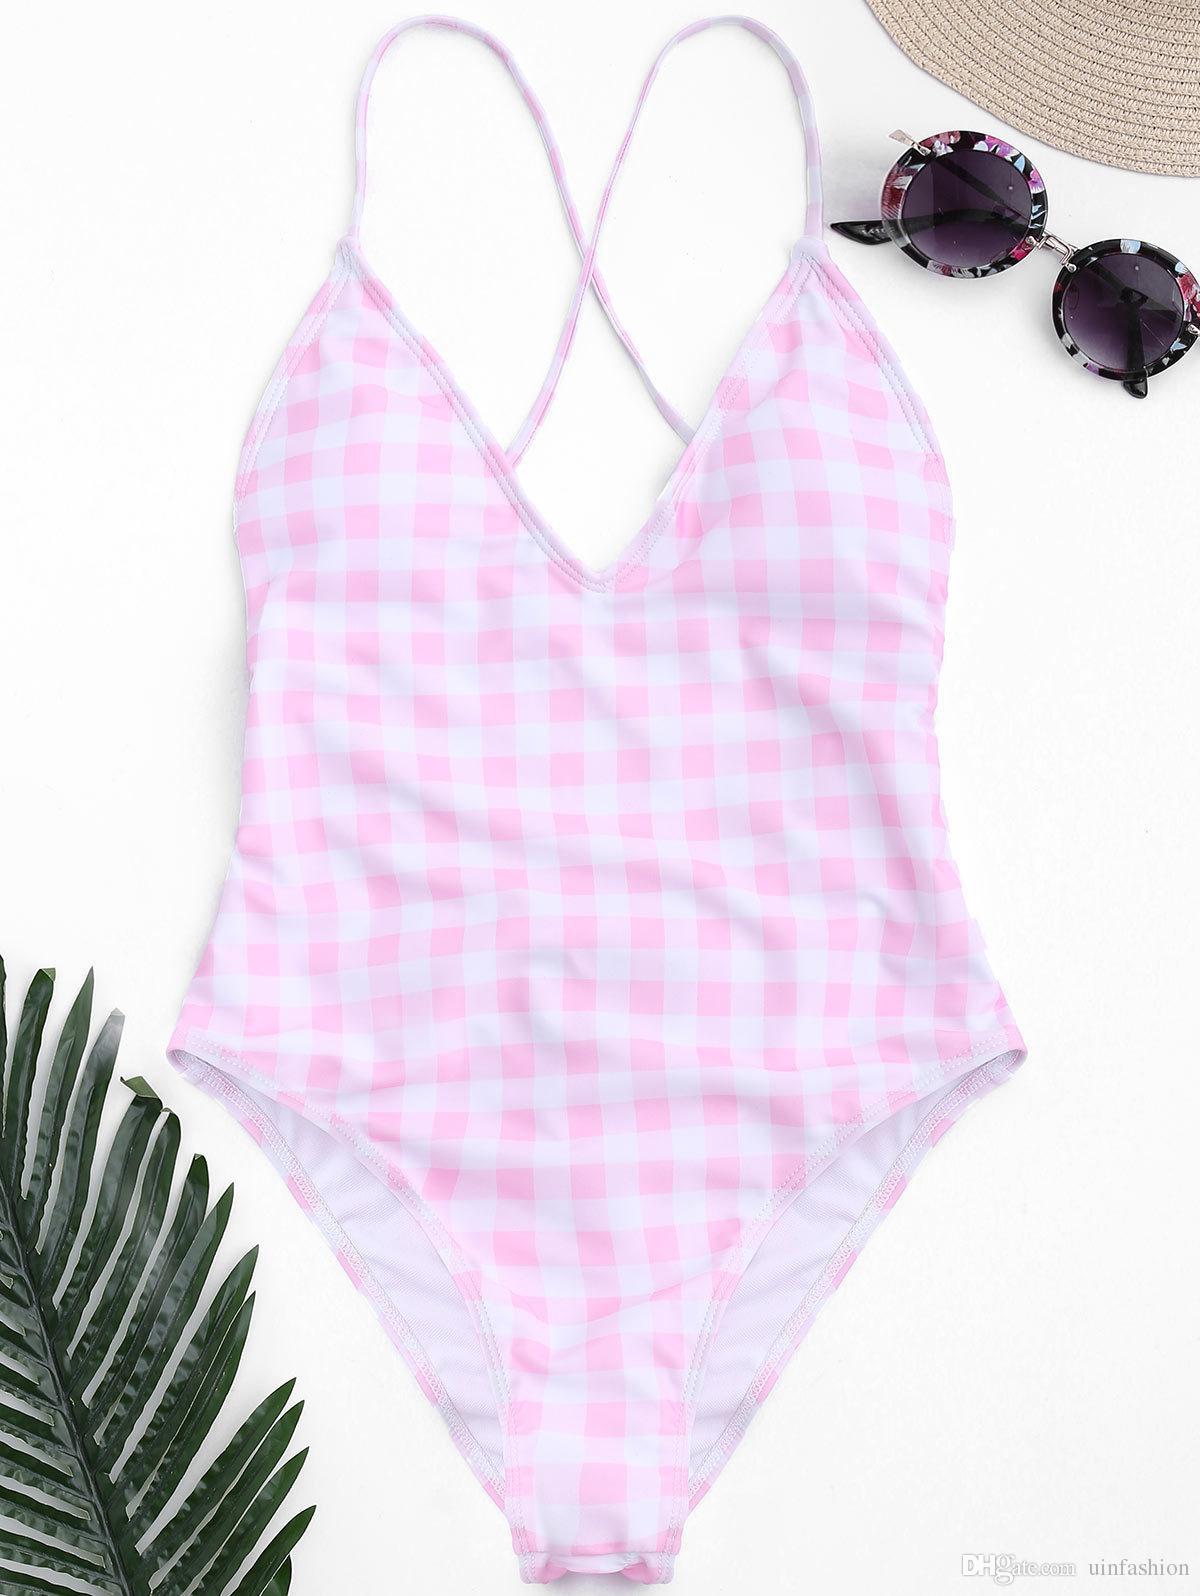 Sexy Women Bikini One Piece Swimsuit Summer Swimwear Grid Blue Pink Beachwear Hot Push Up Padded Bathing Suits Thong Monokini